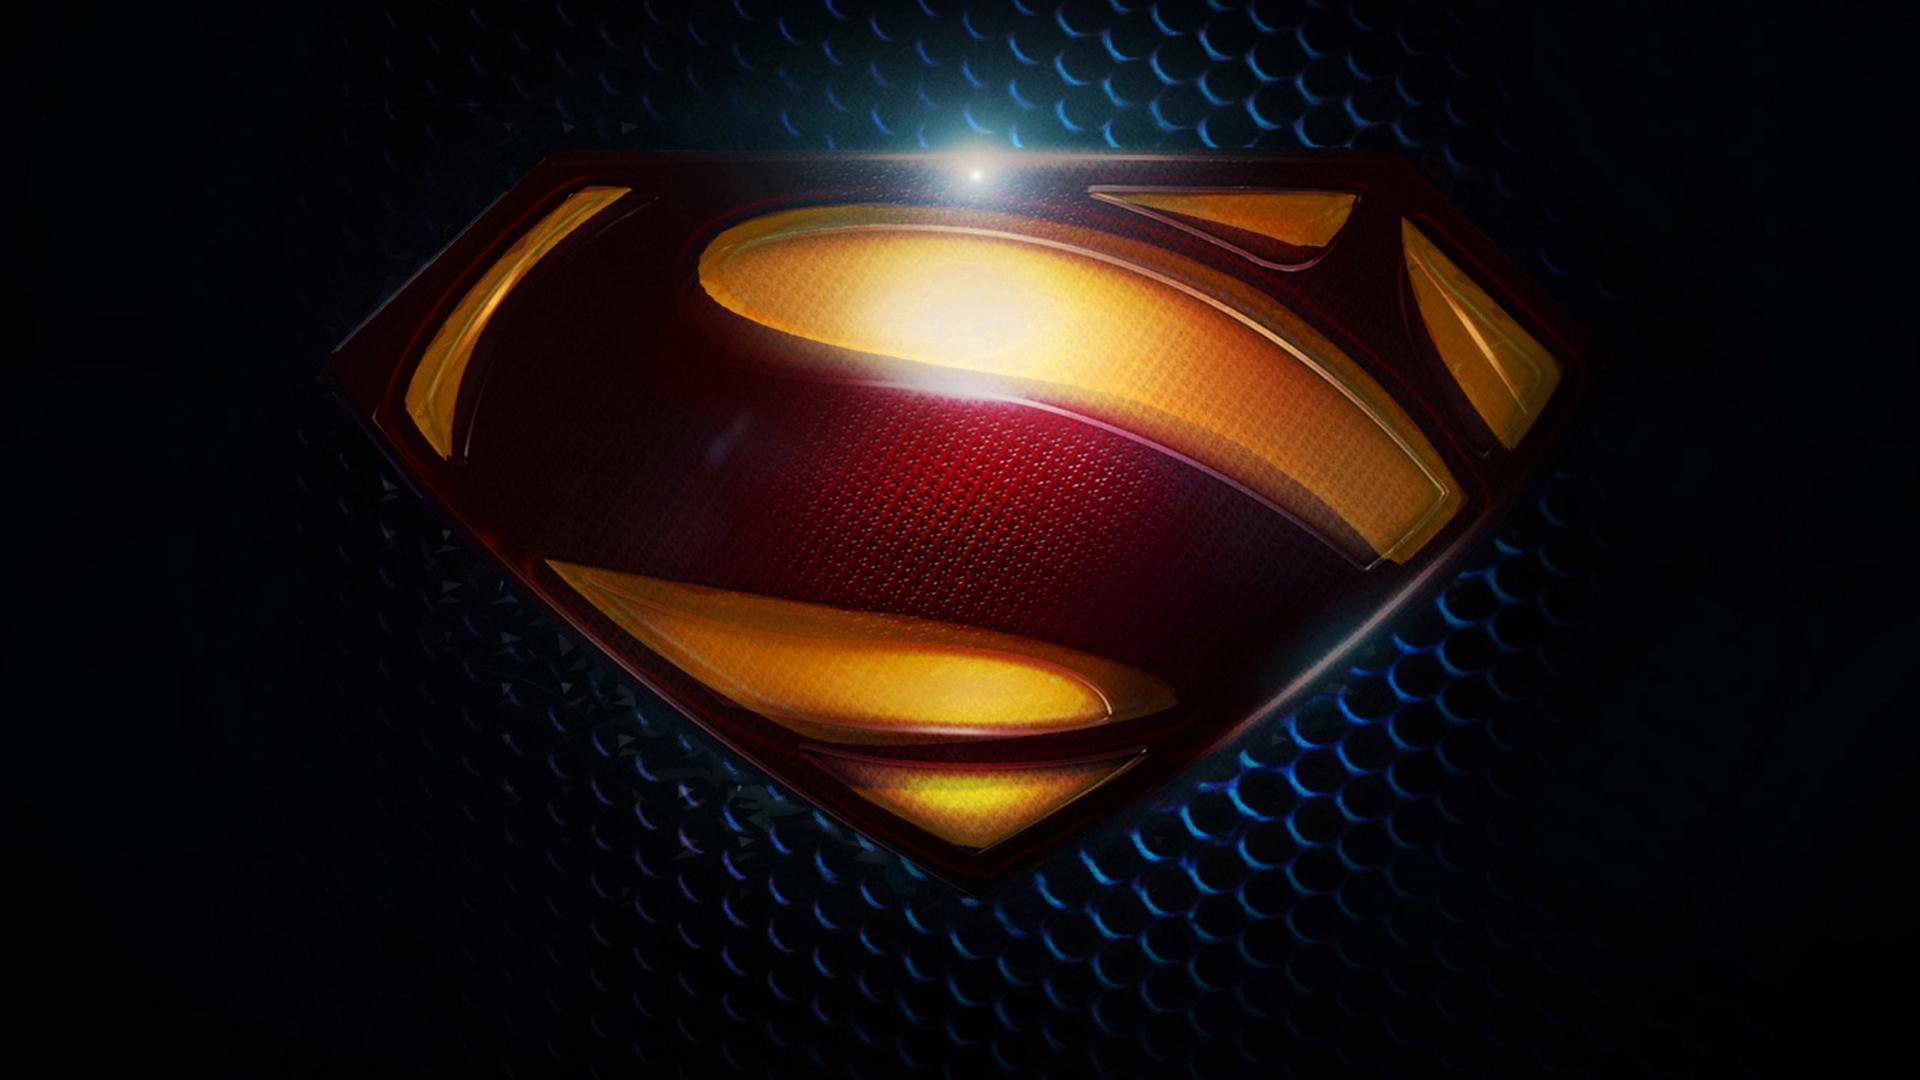 superman desktop wallpaper in - photo #41